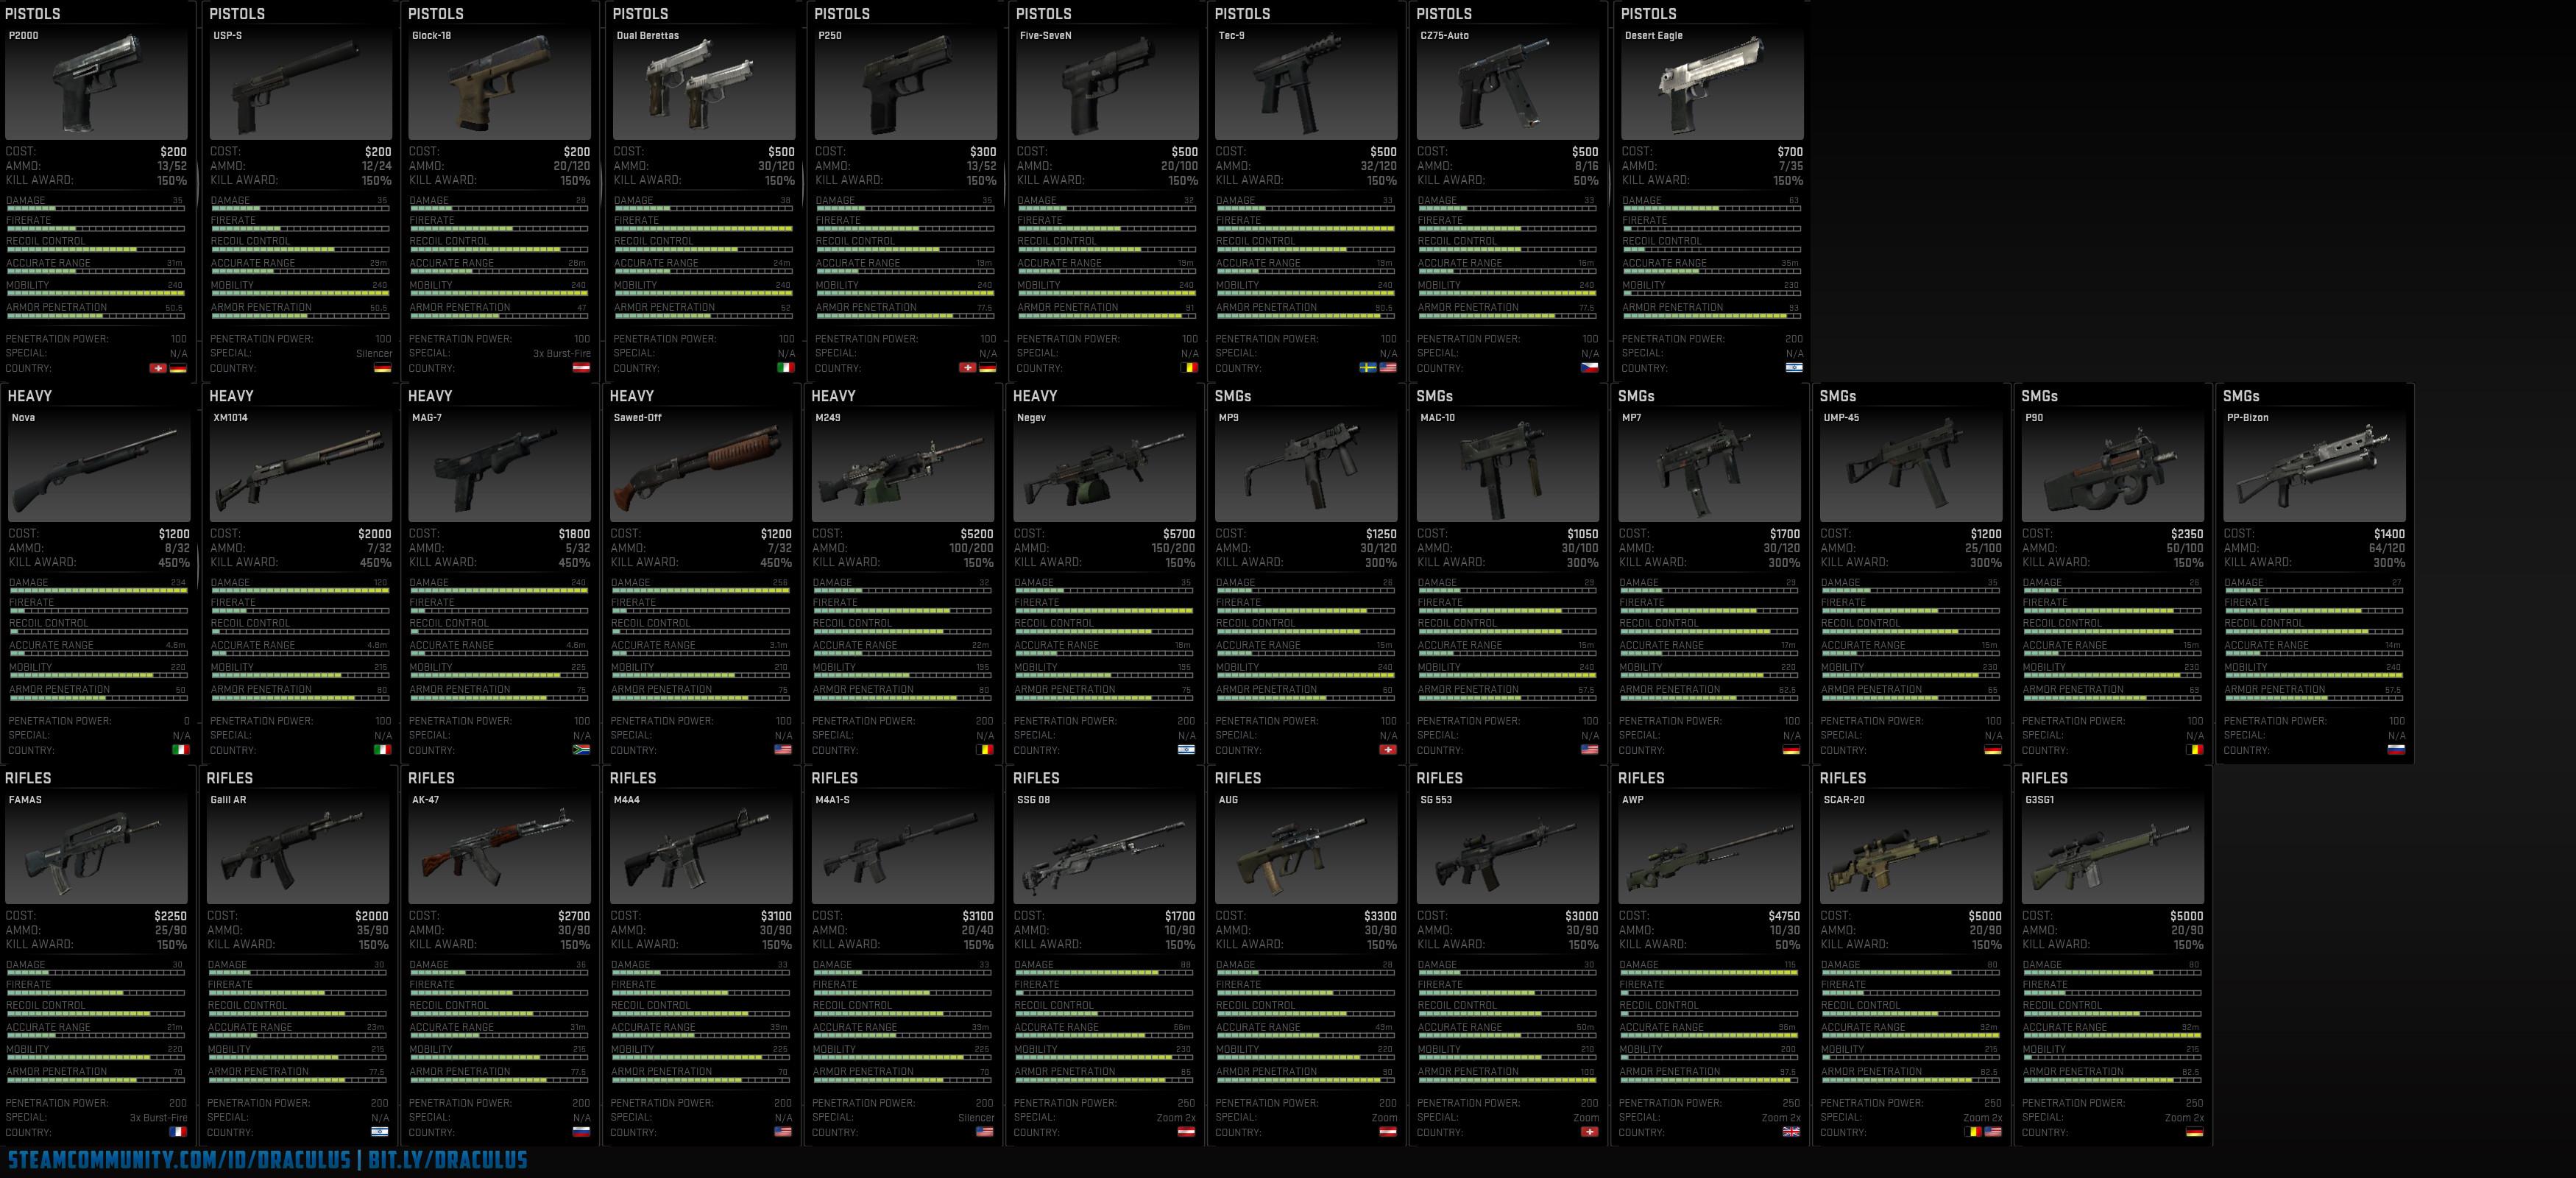 Pistol comparison csgo cases4real читерский кейс